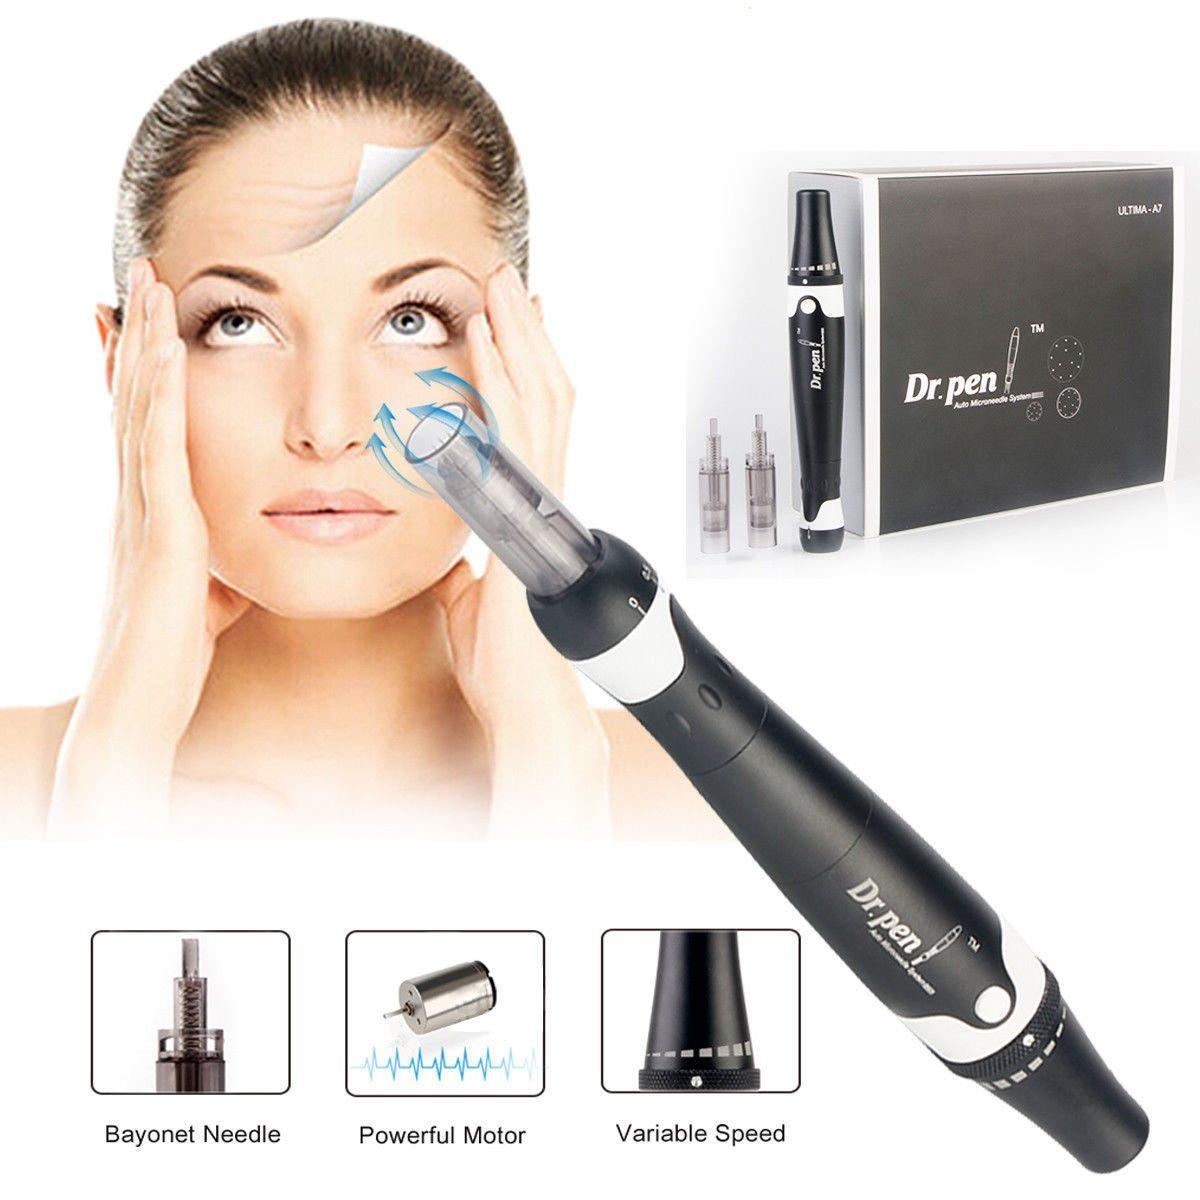 2018 Newest Derma Pen For Sale Dr pen A7 Microneedle Dermapen With 50pcs  Needle Cartridges For Scar Removal Acne Treatment Anti Hair Loss